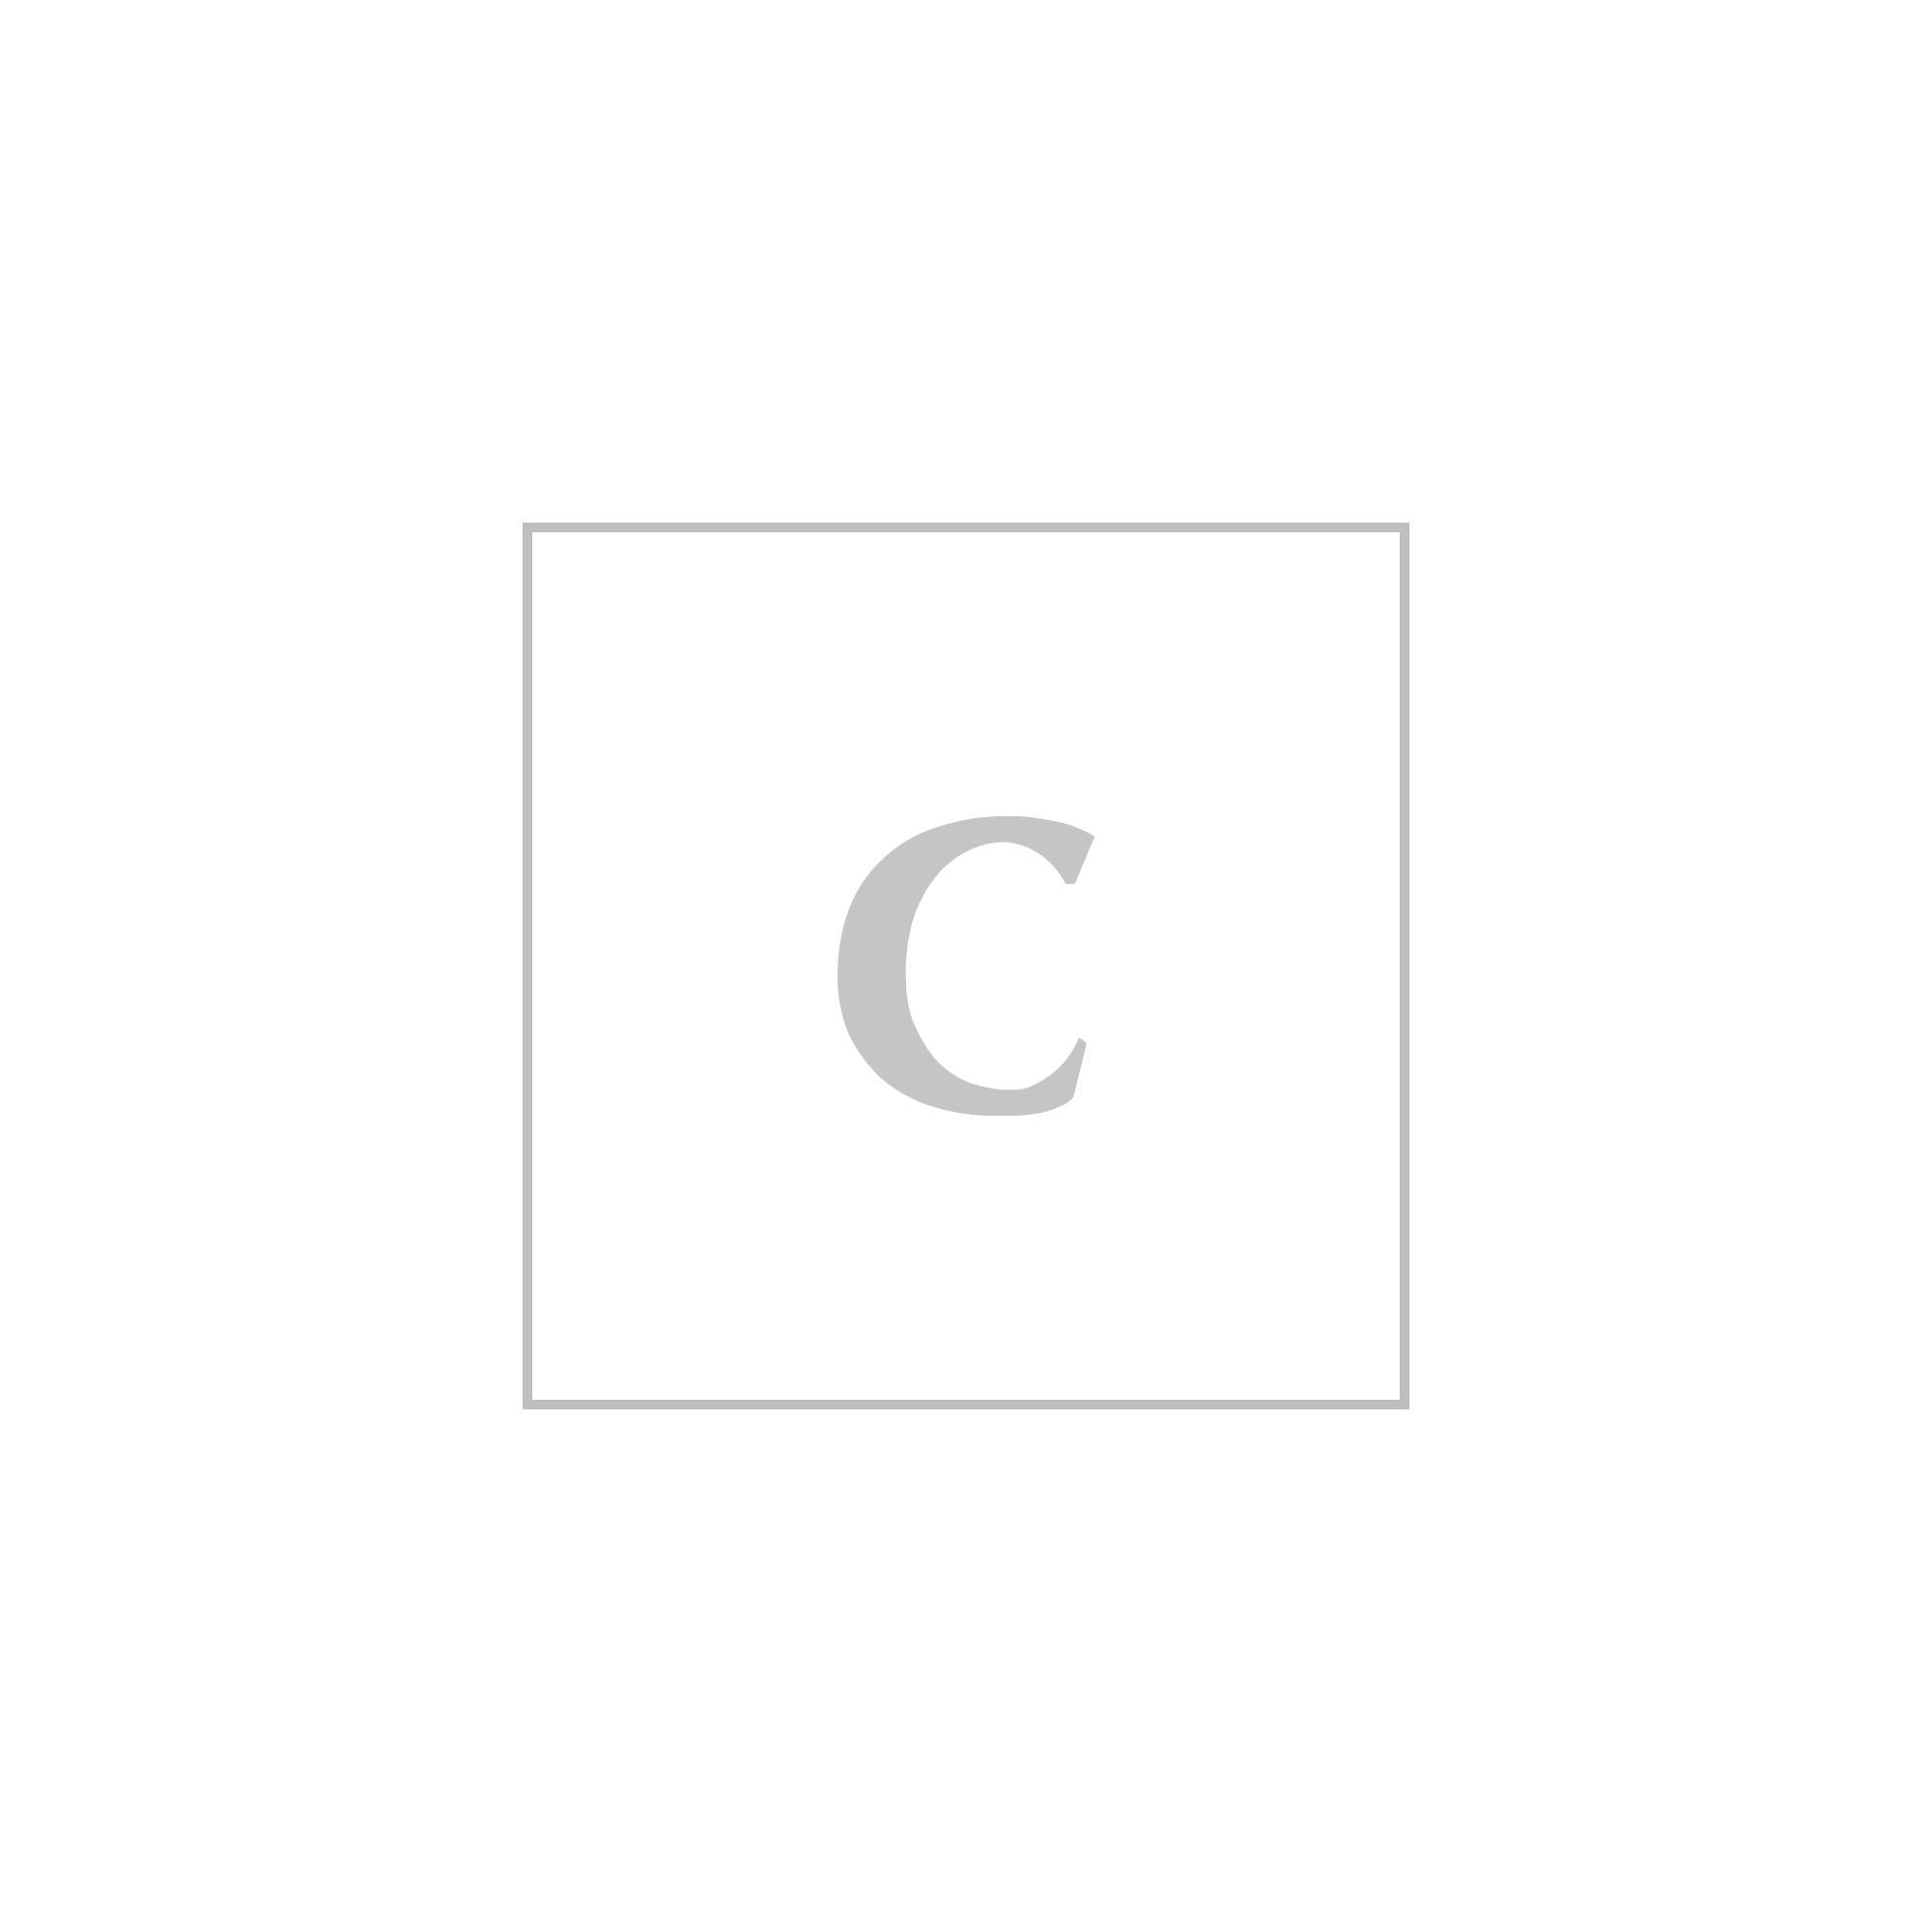 Fendi pullover dynamic geometry cashmere